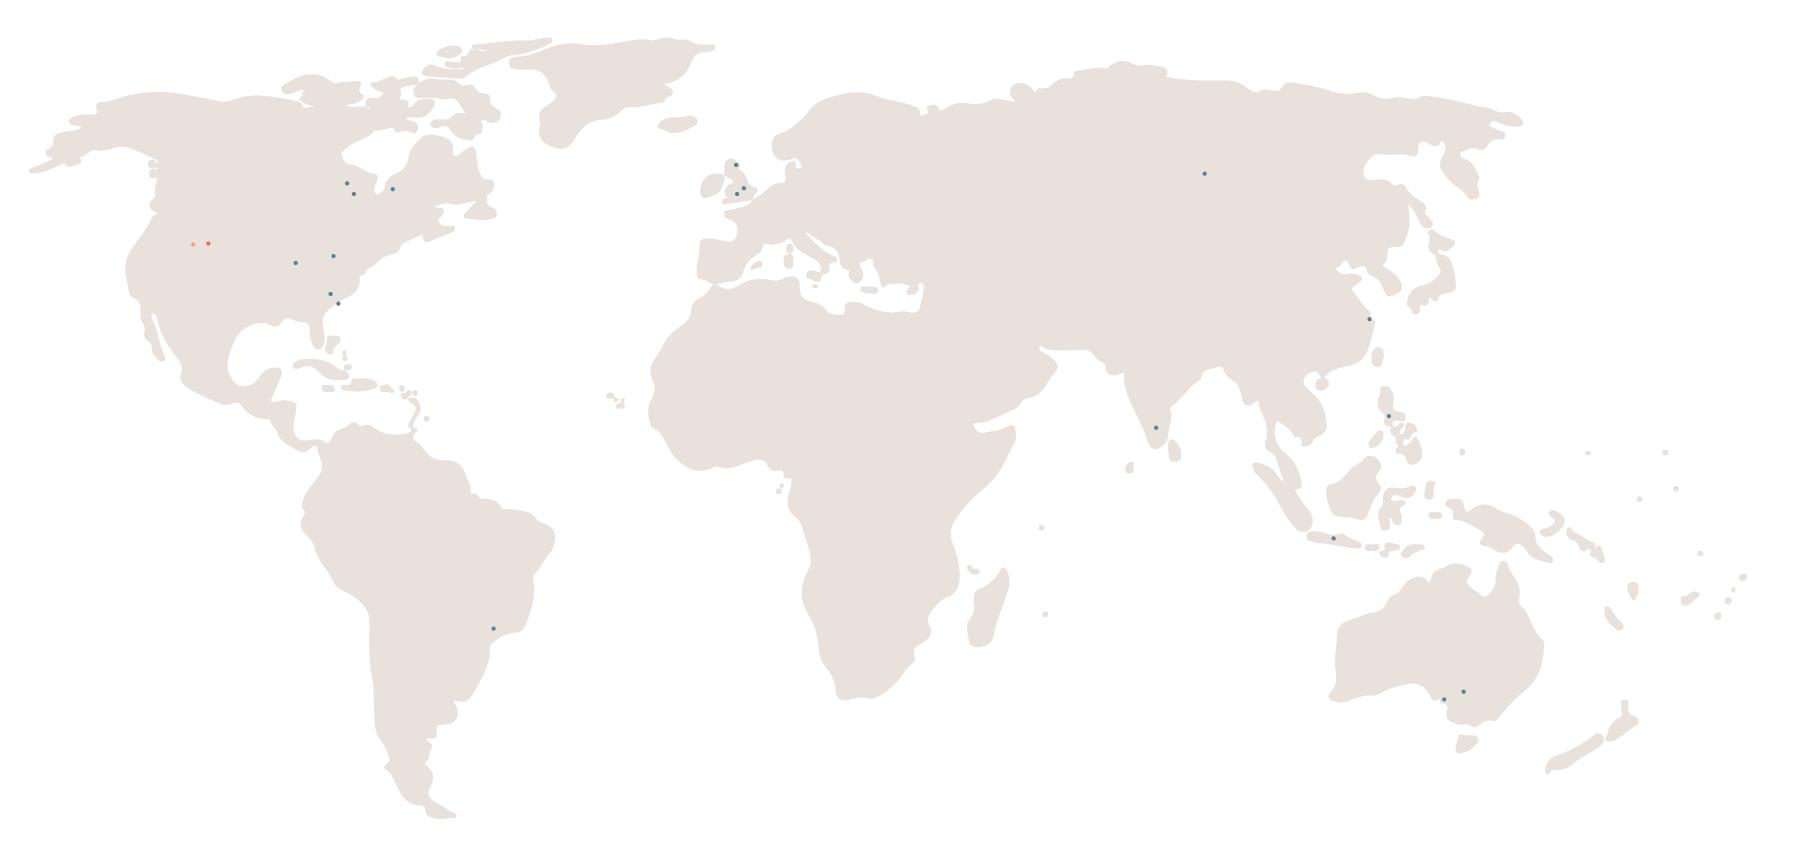 BSP_WorldMap_12-8-2018.png